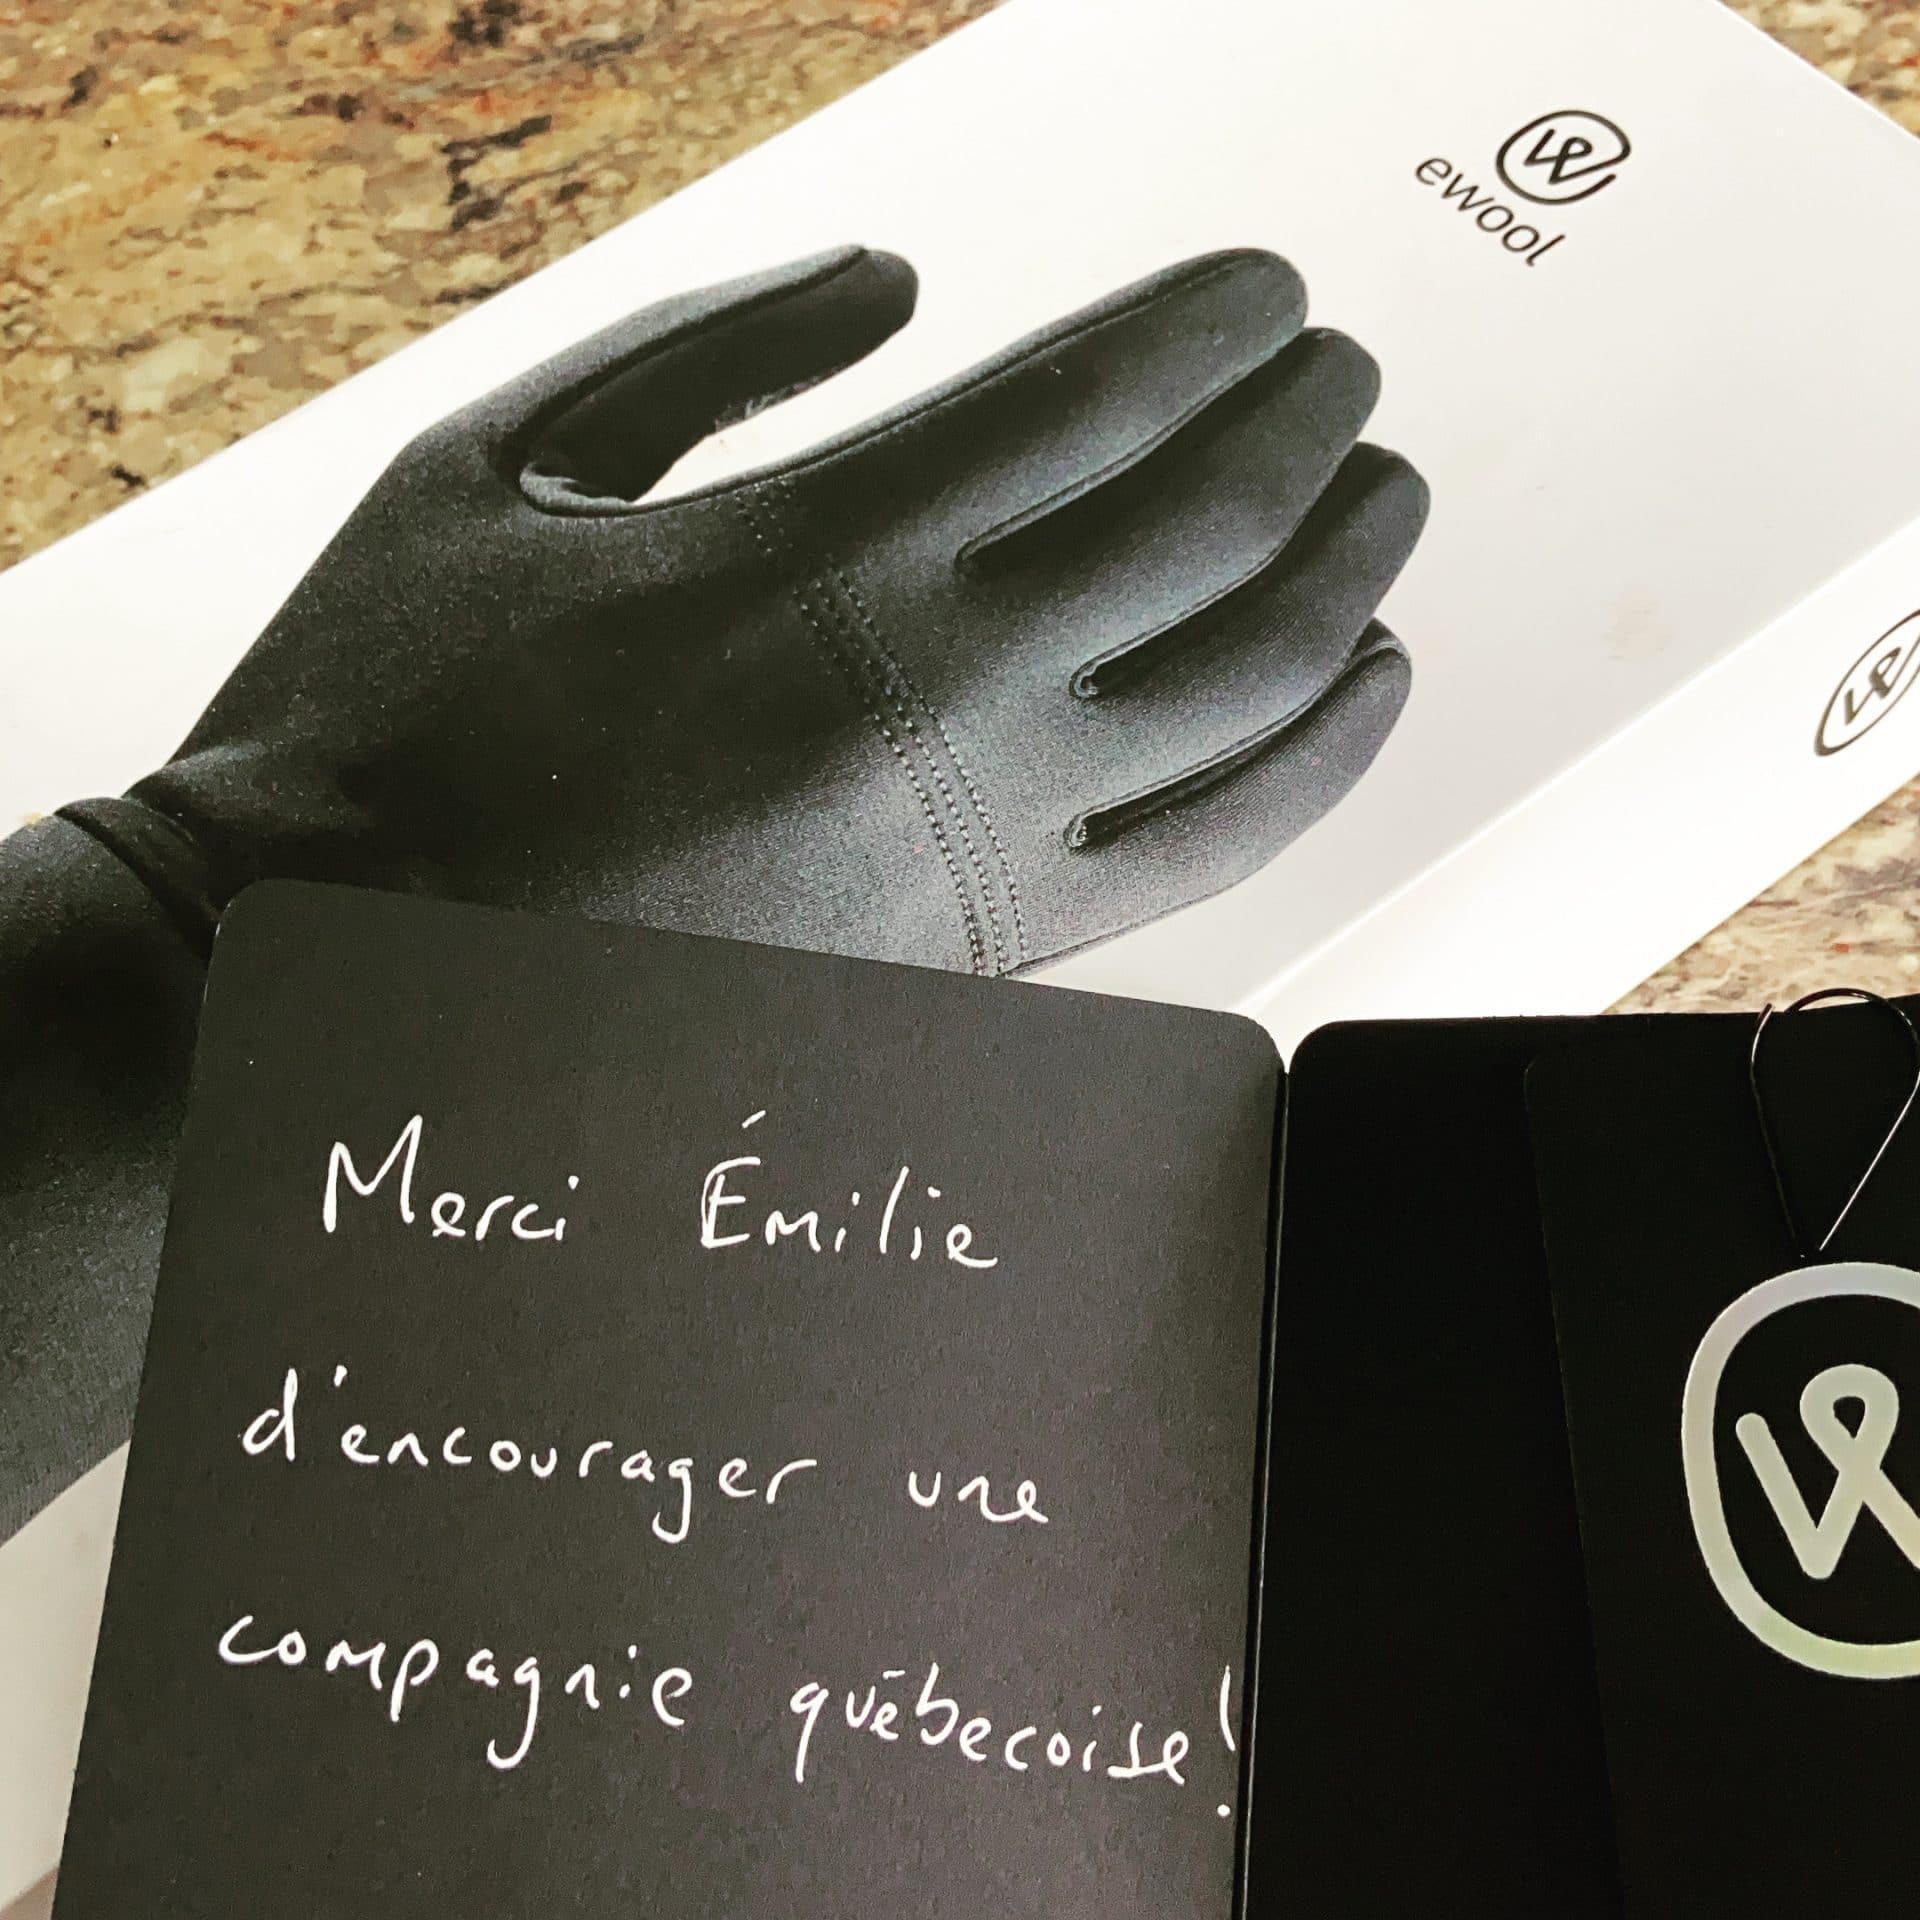 Ewool : Essai de la doublure chauffante pour gants